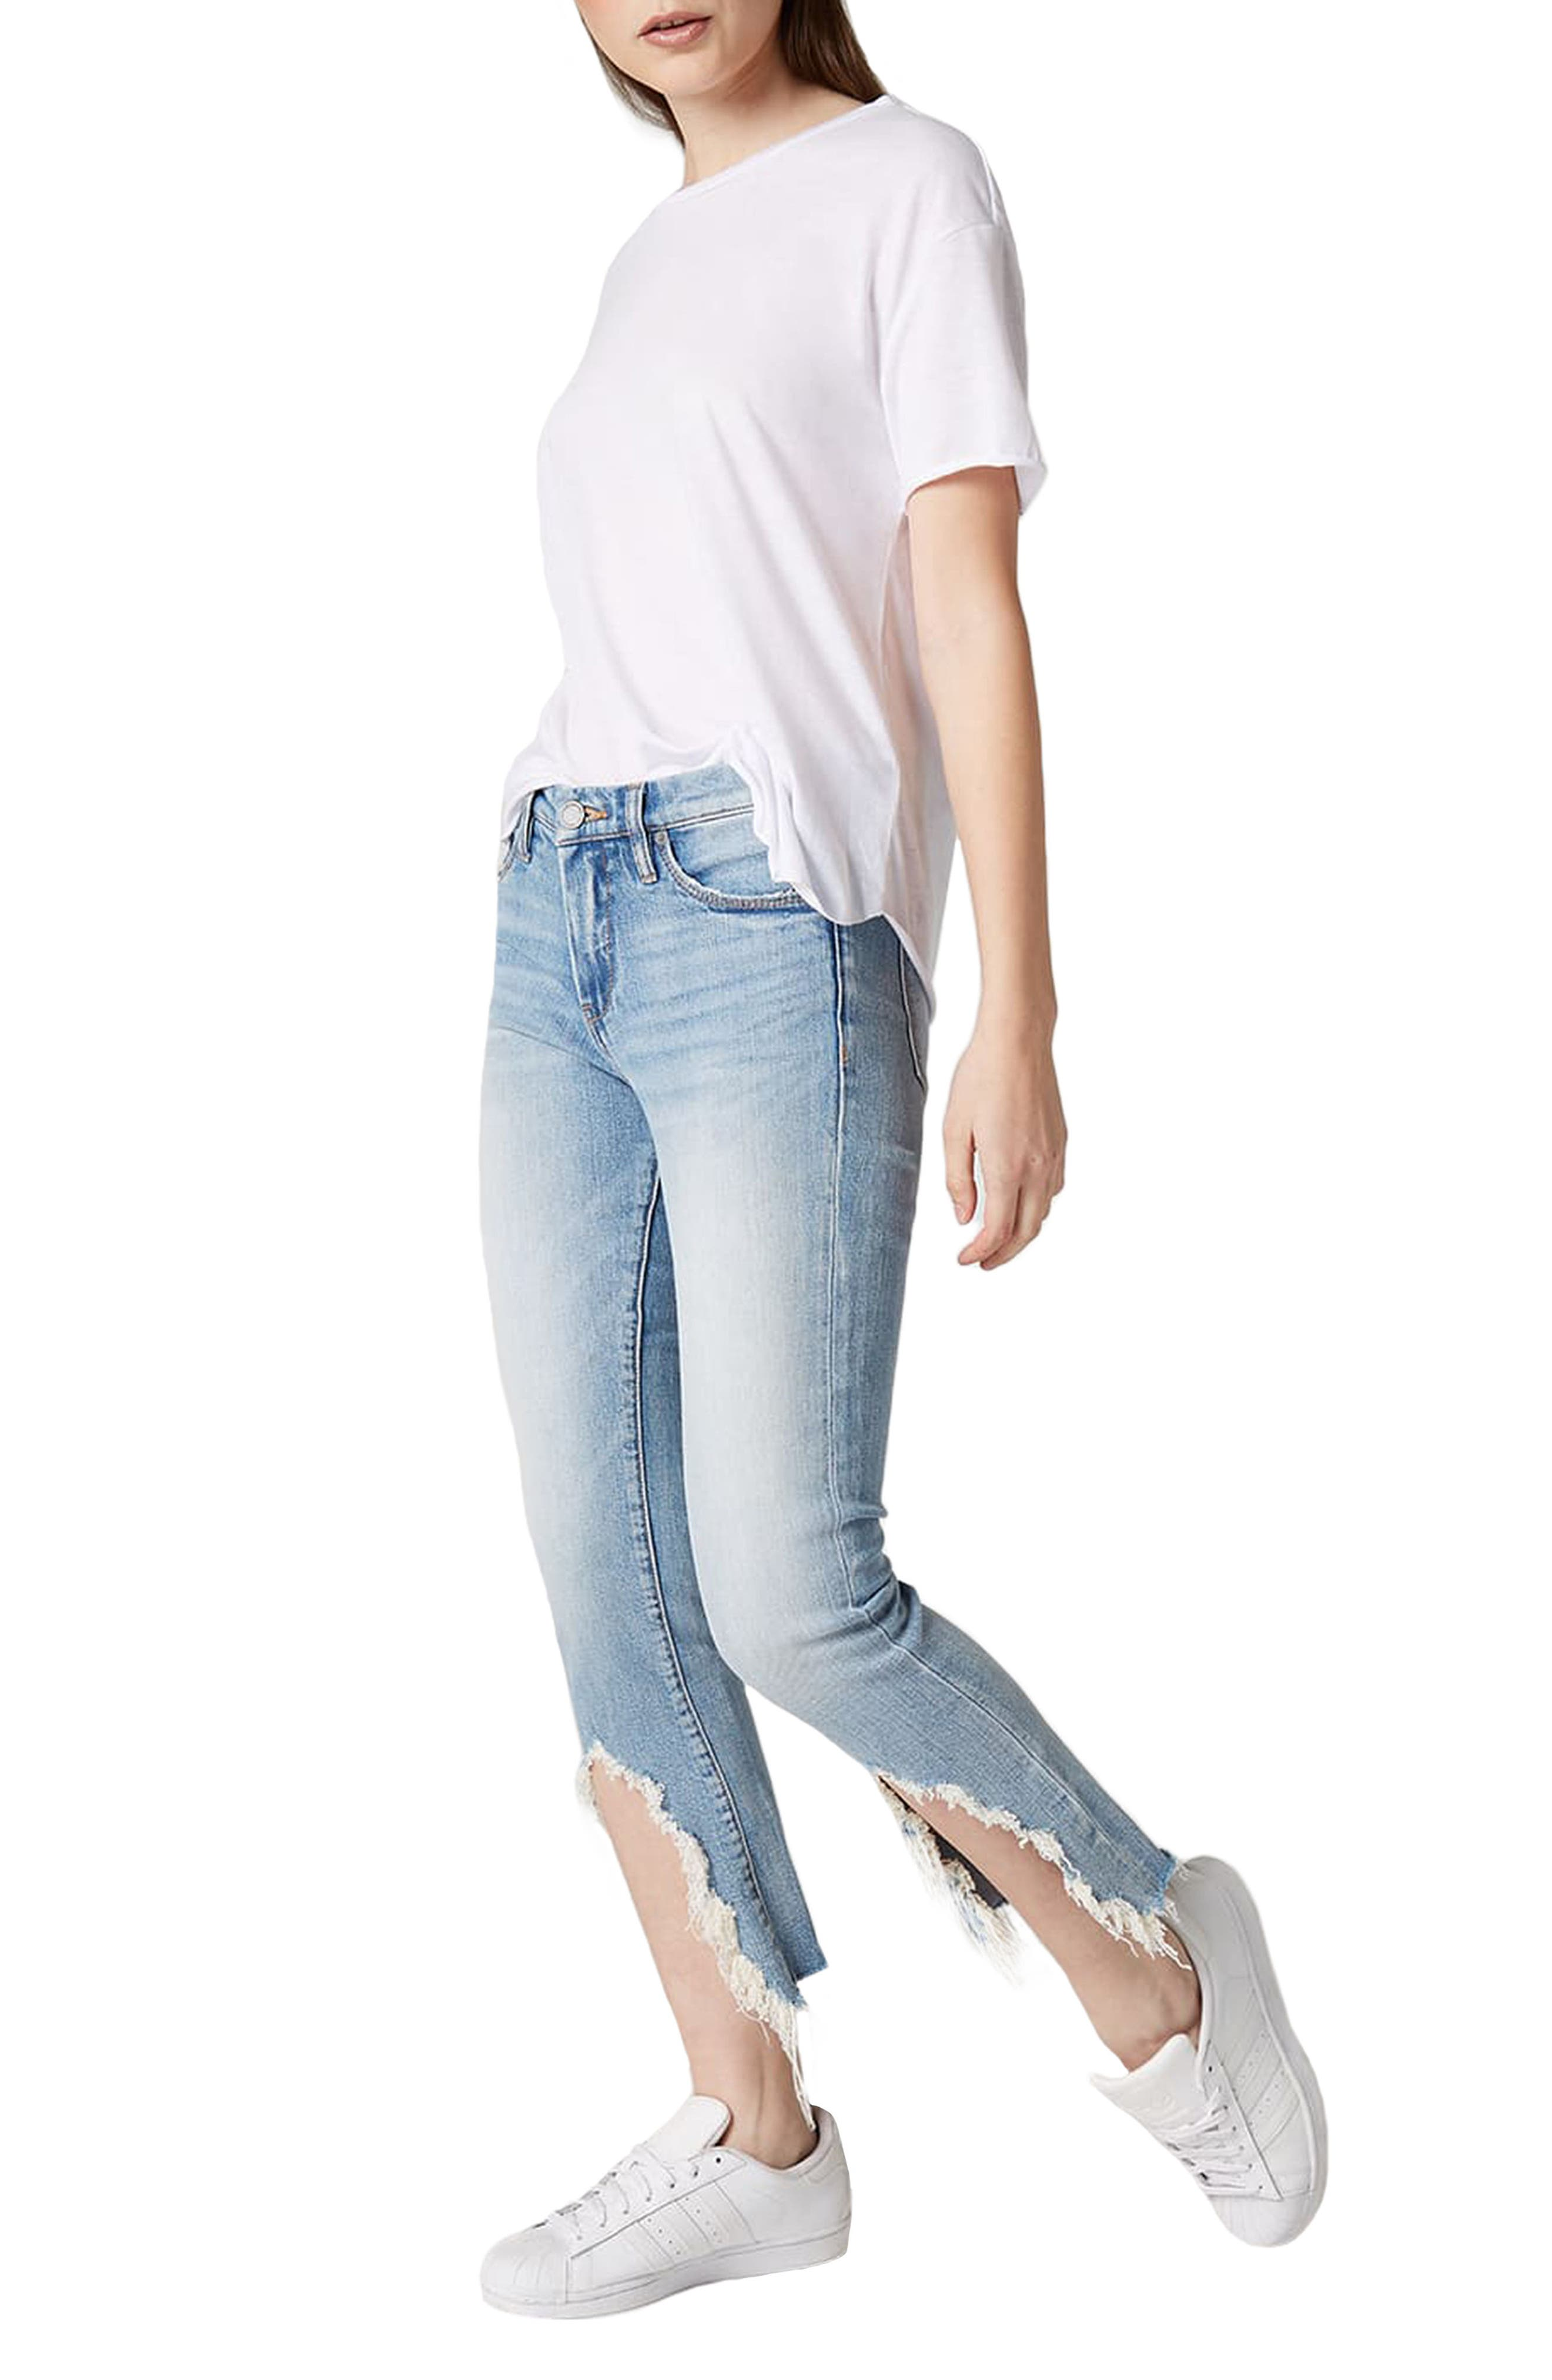 Constant Convo Distressed Hem Jeans,                             Alternate thumbnail 4, color,                             400